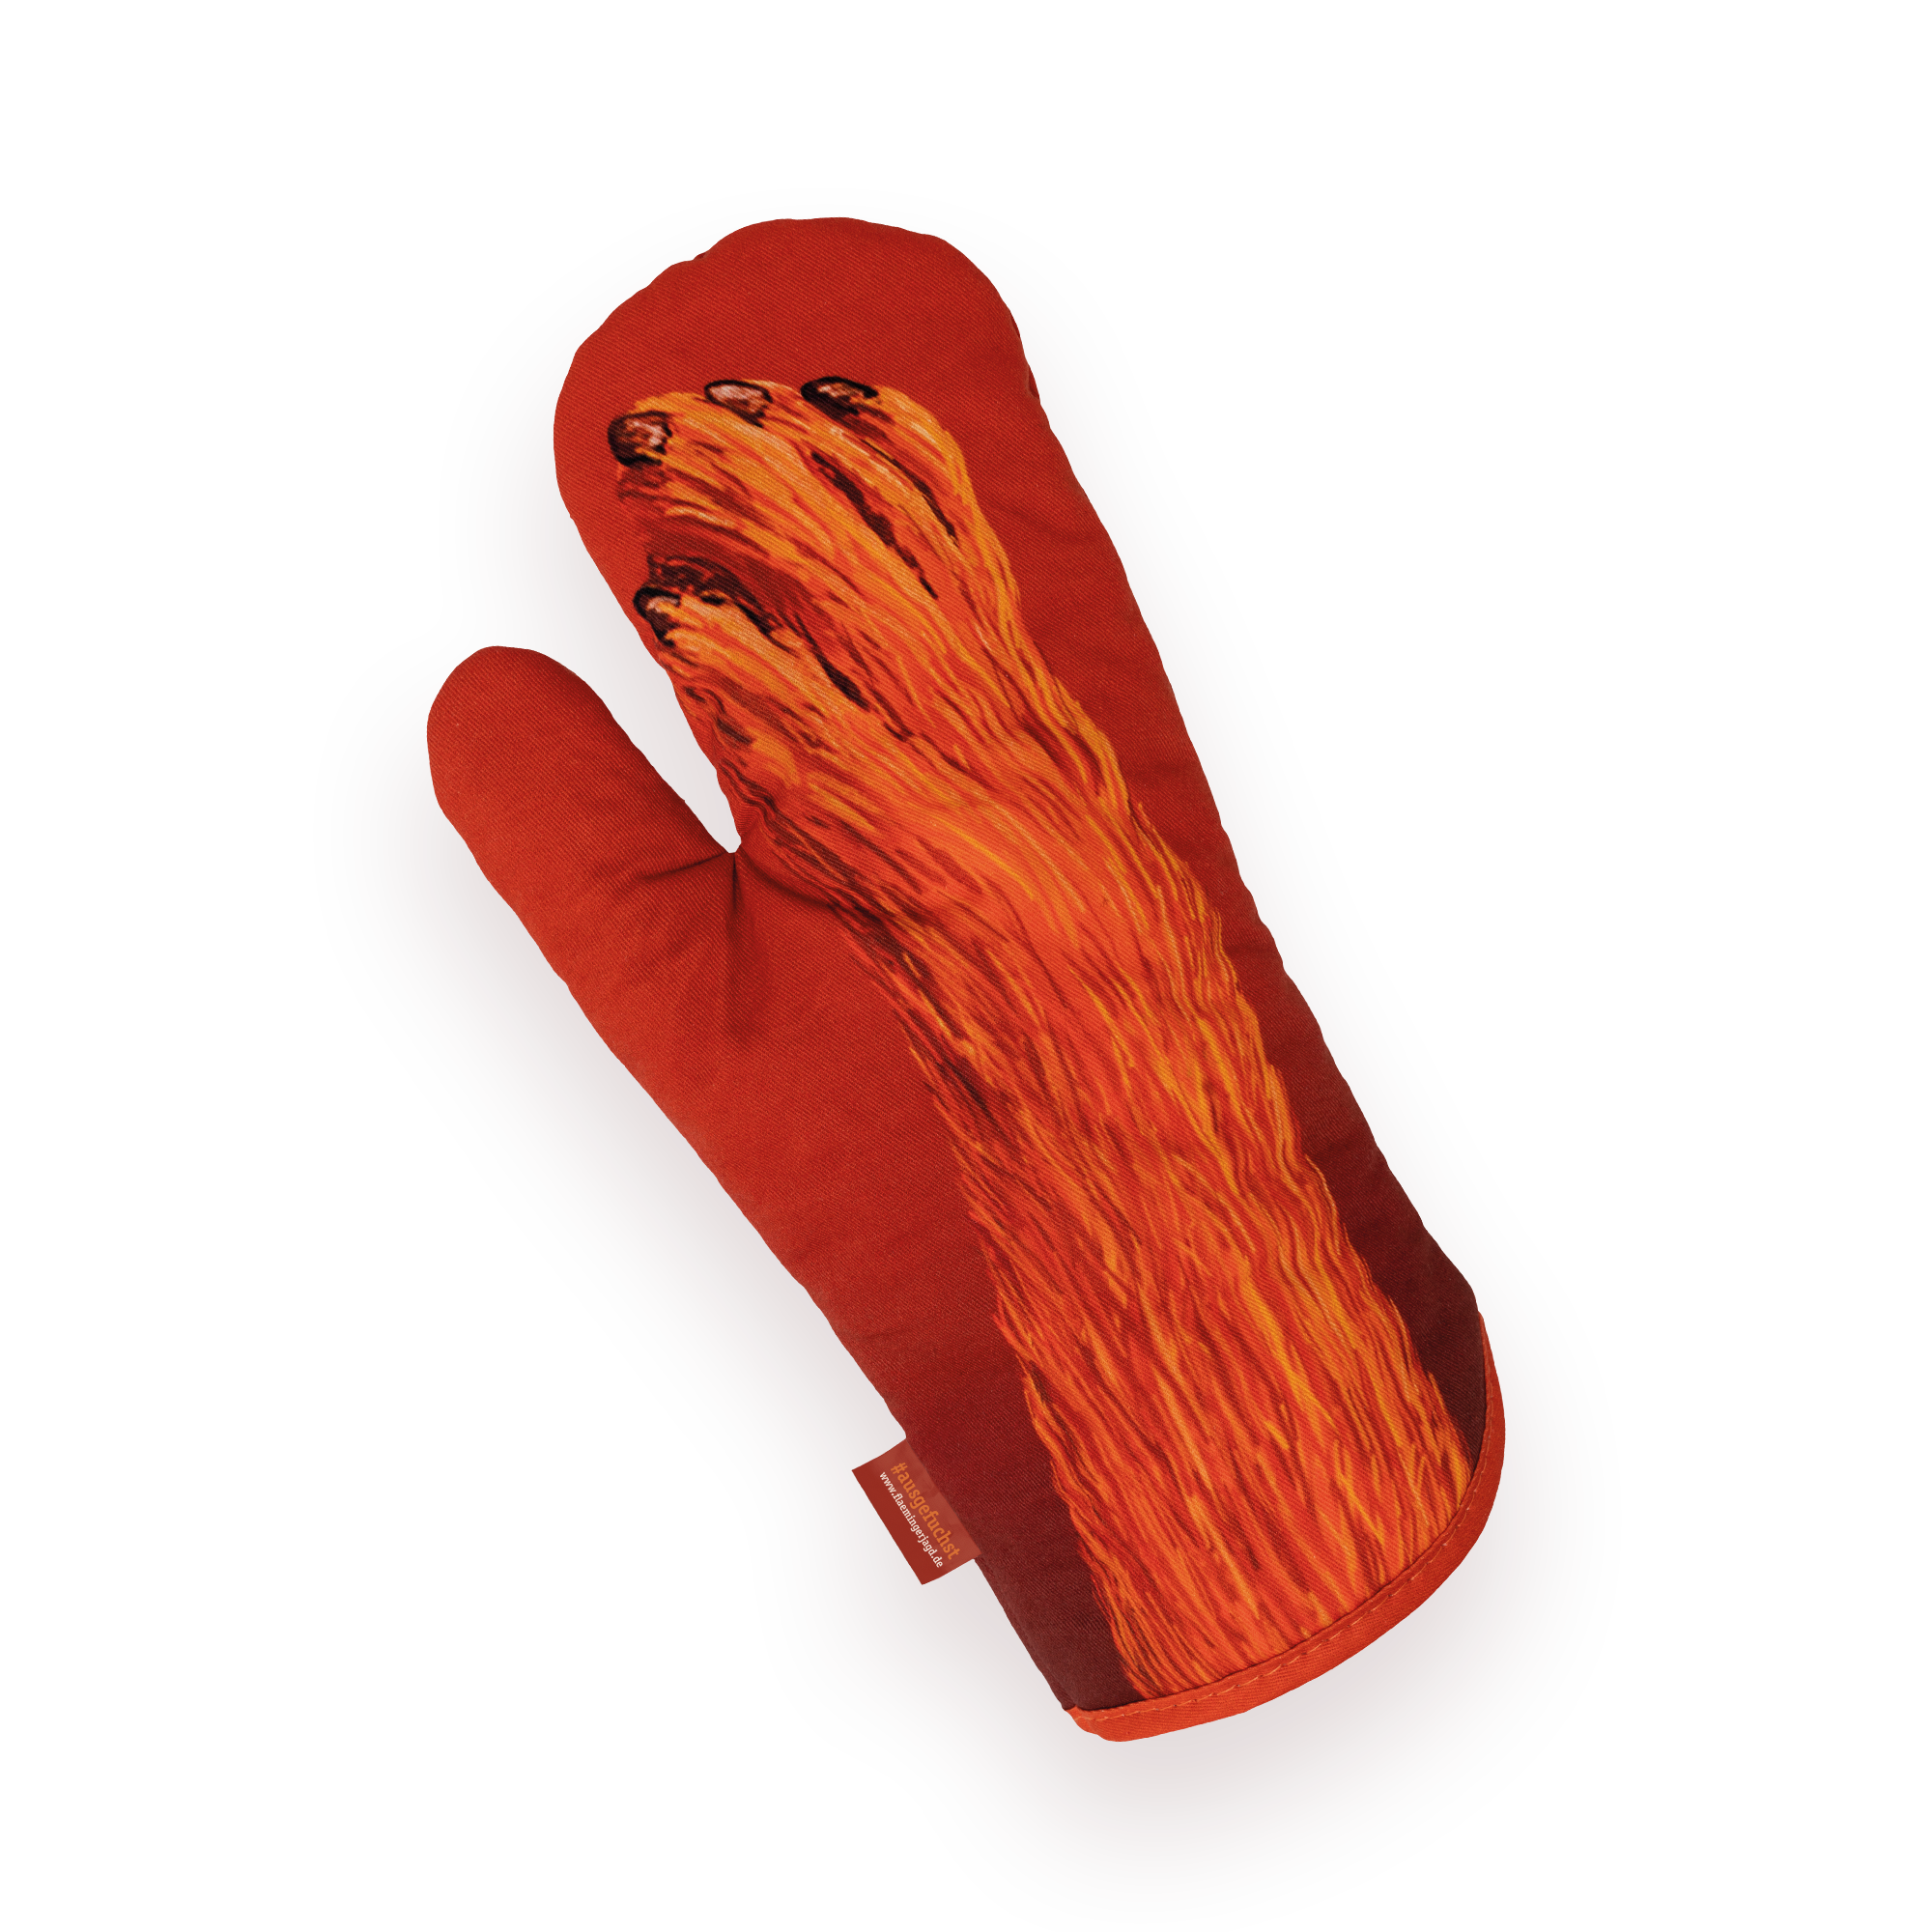 Grillhandschuh